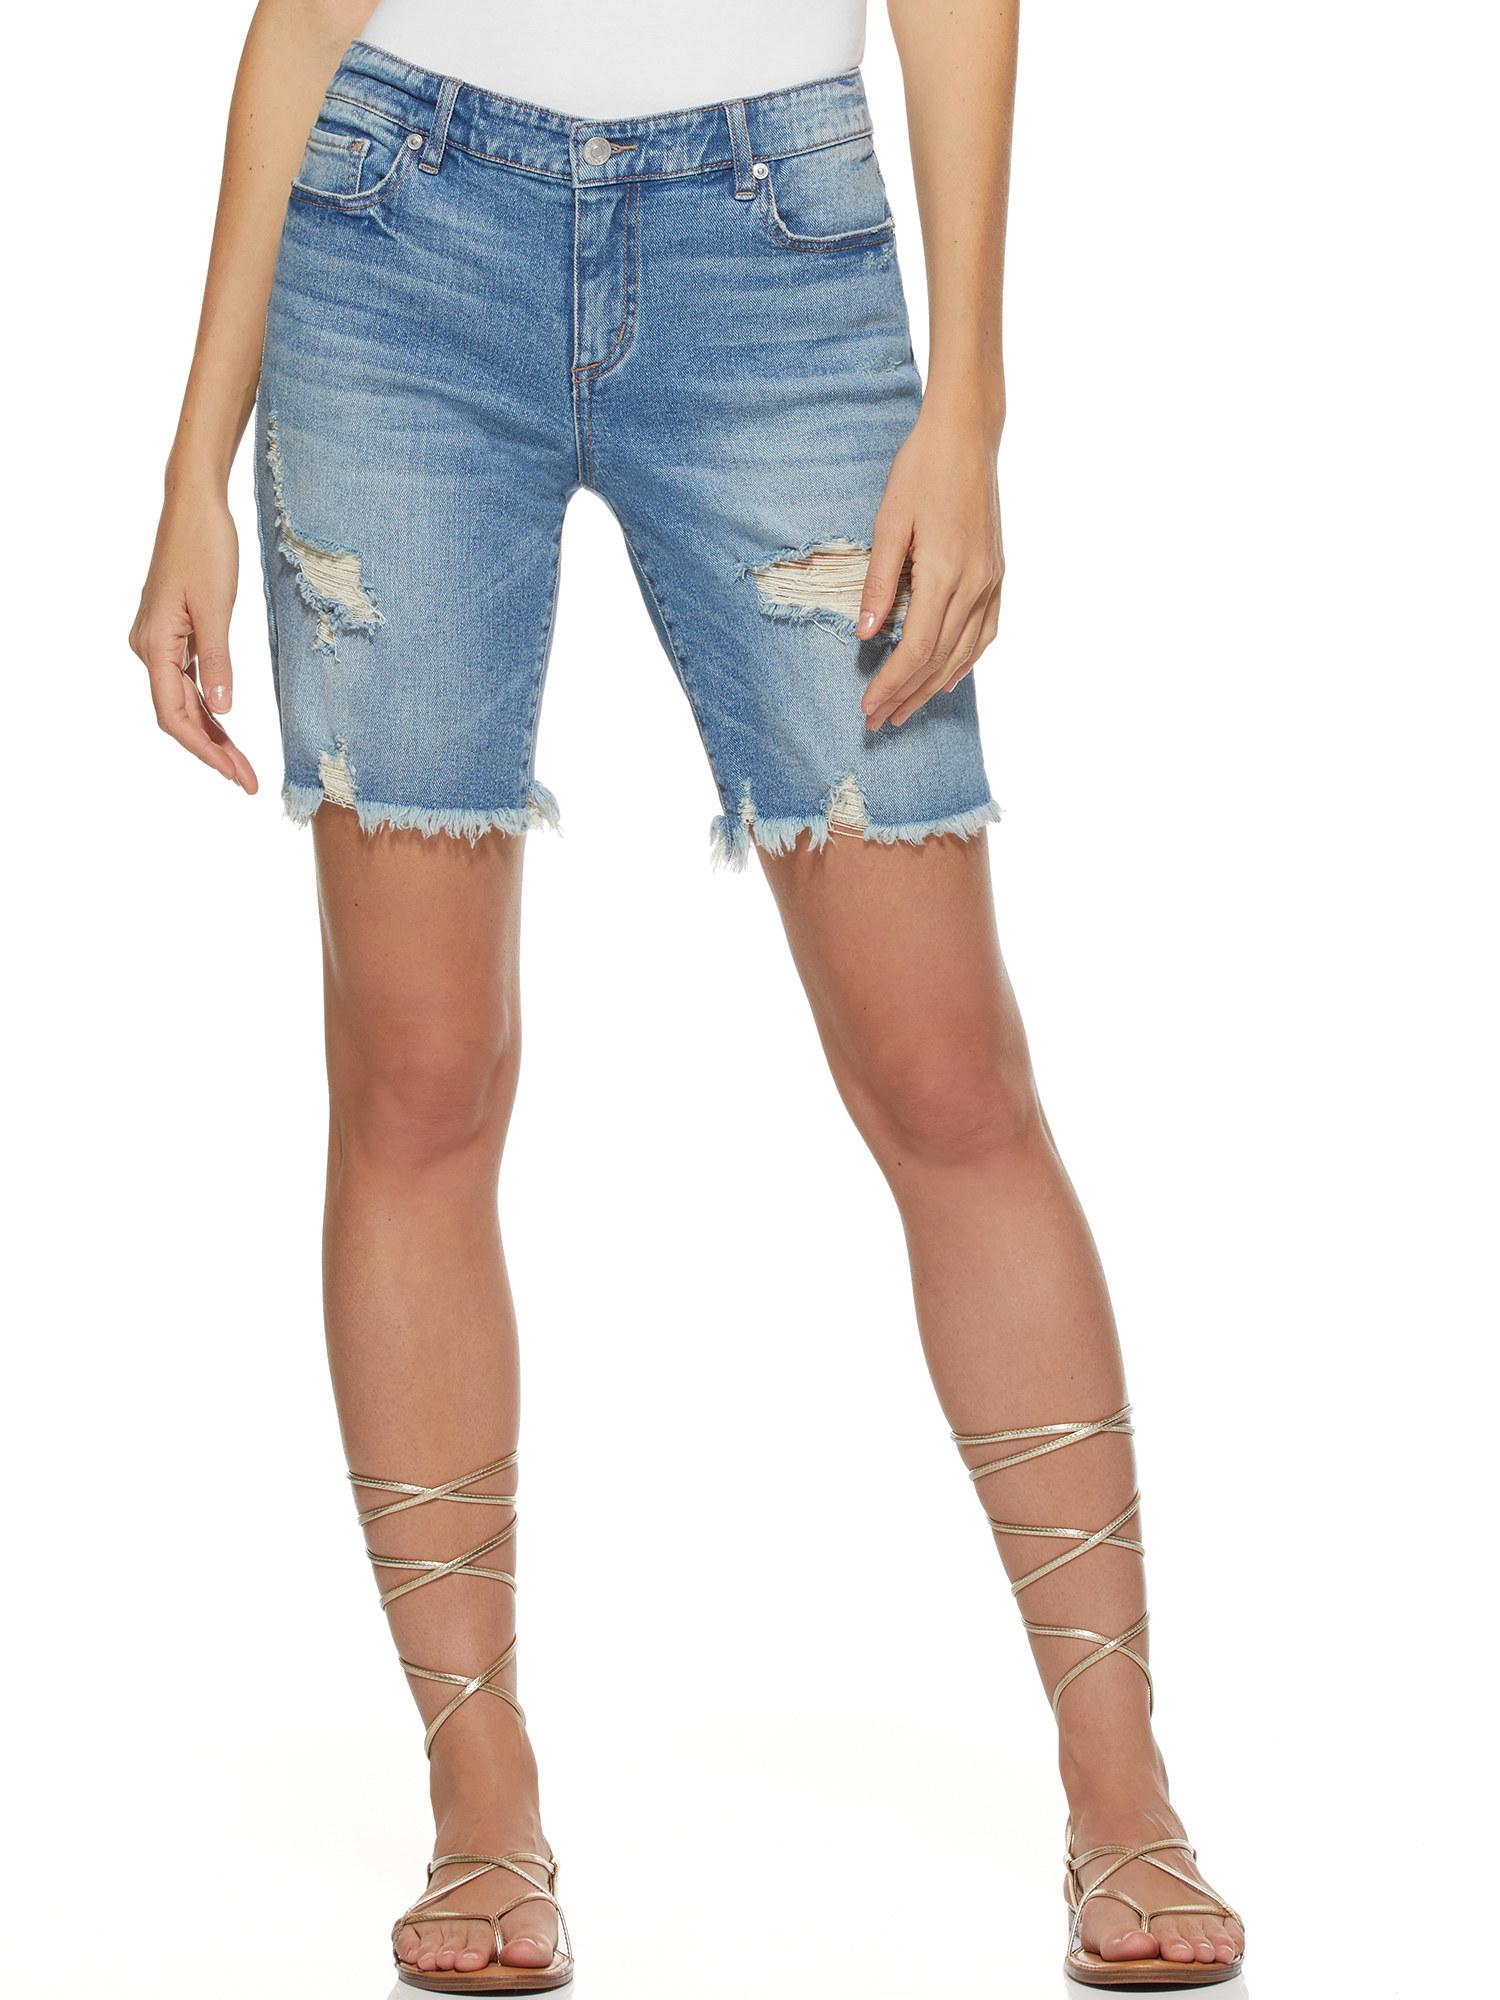 Model in distressed medium denim bermuda shorts